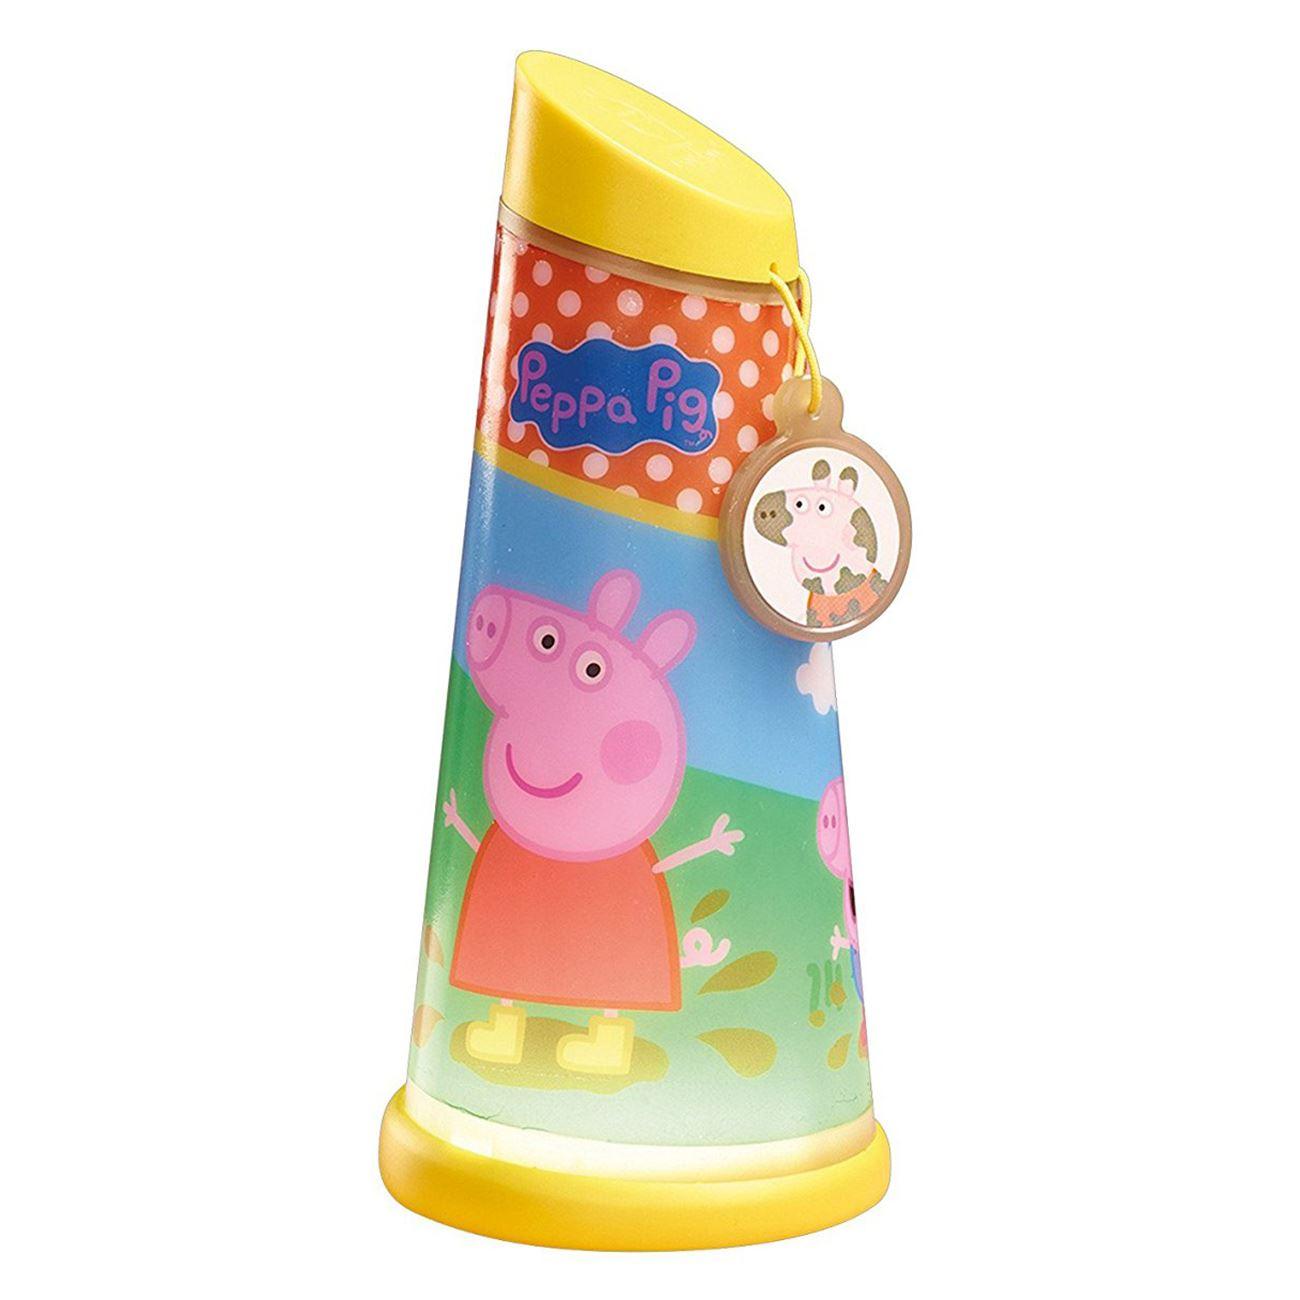 Indexbild 63 - GO GLOW NIGHT BEAM TILT TORCH LIGHTING LIGHT KIDS BEDROOM